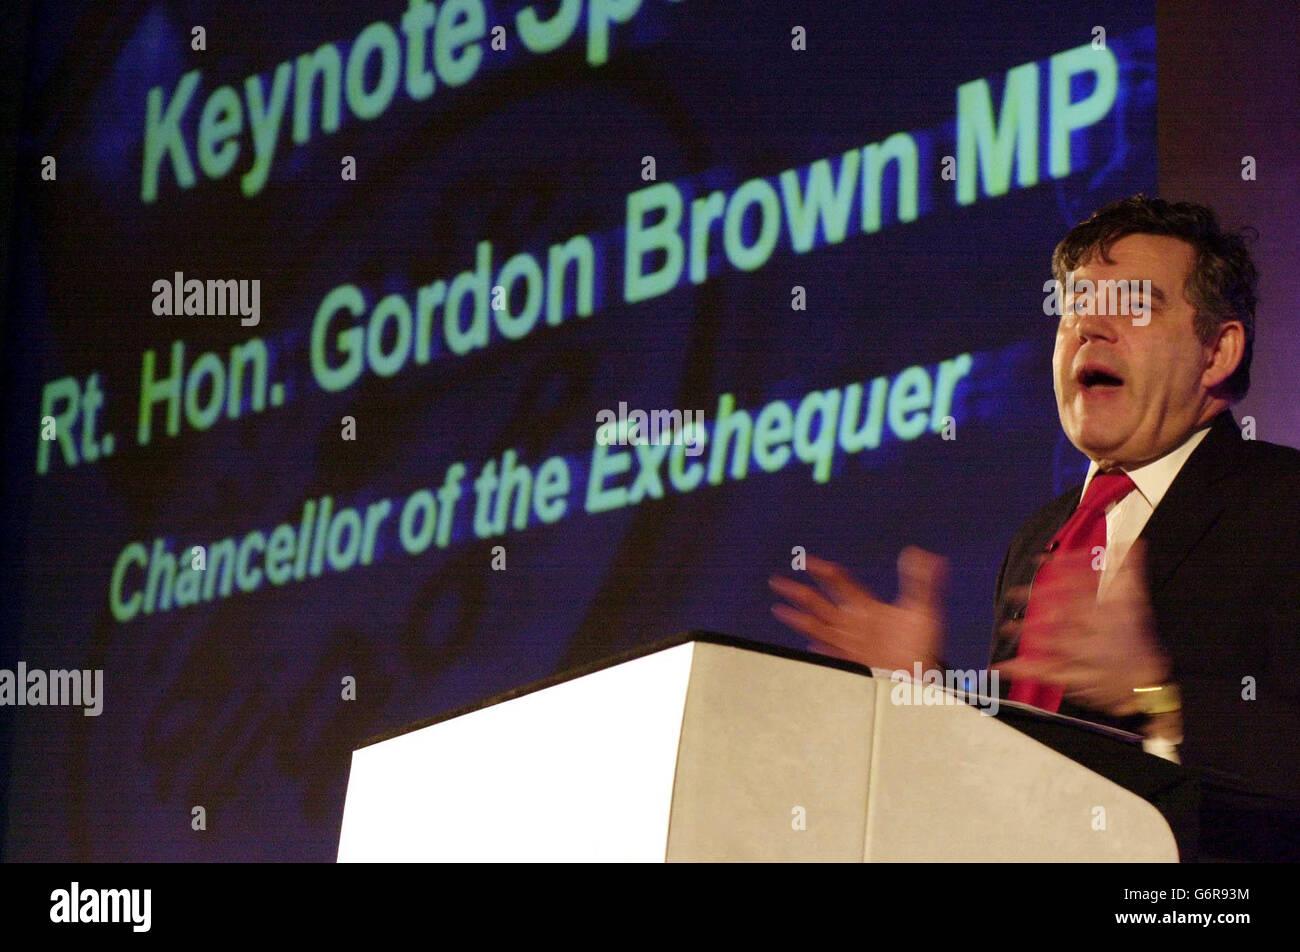 Gordon Brown Keynote Speech - Stock Image